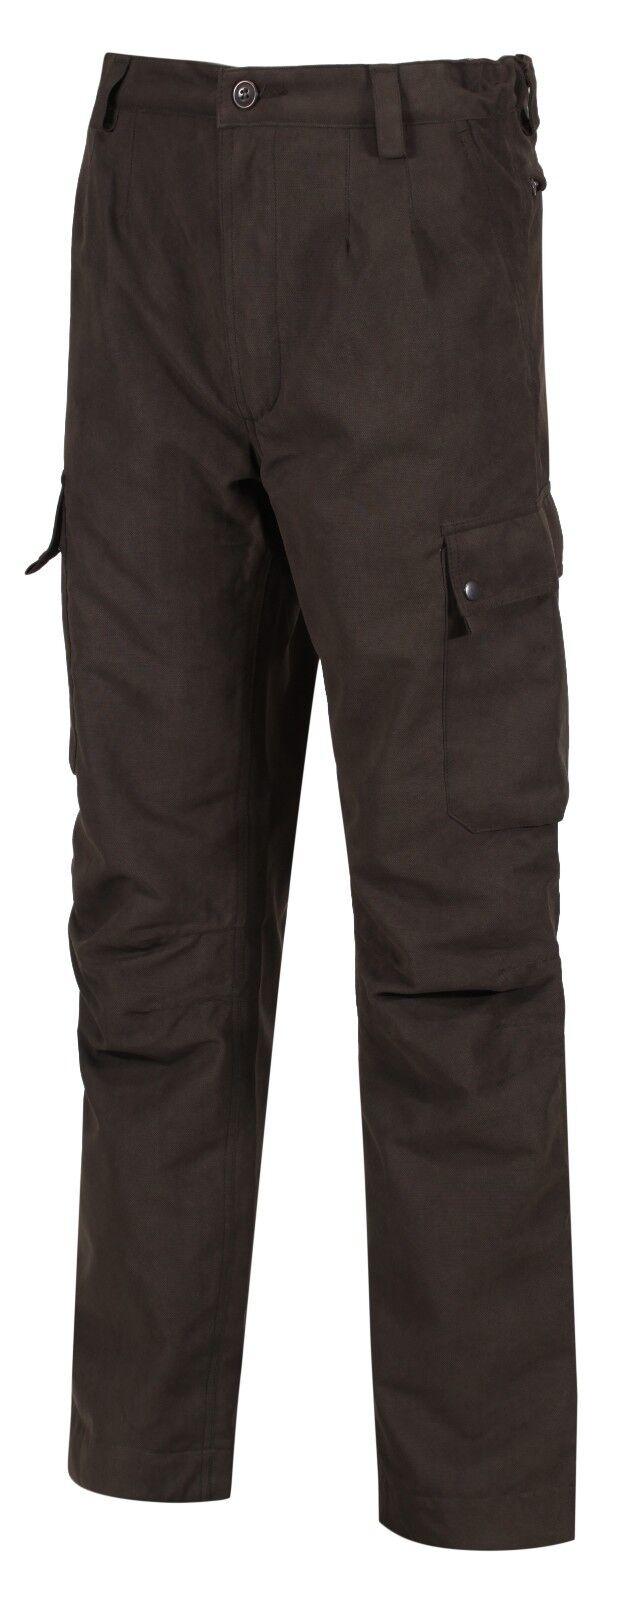 Burford Impermeable Pantalones de disparo Stalking Stealth Silencioso Pantalón    Nuevo  hasta 60% de descuento